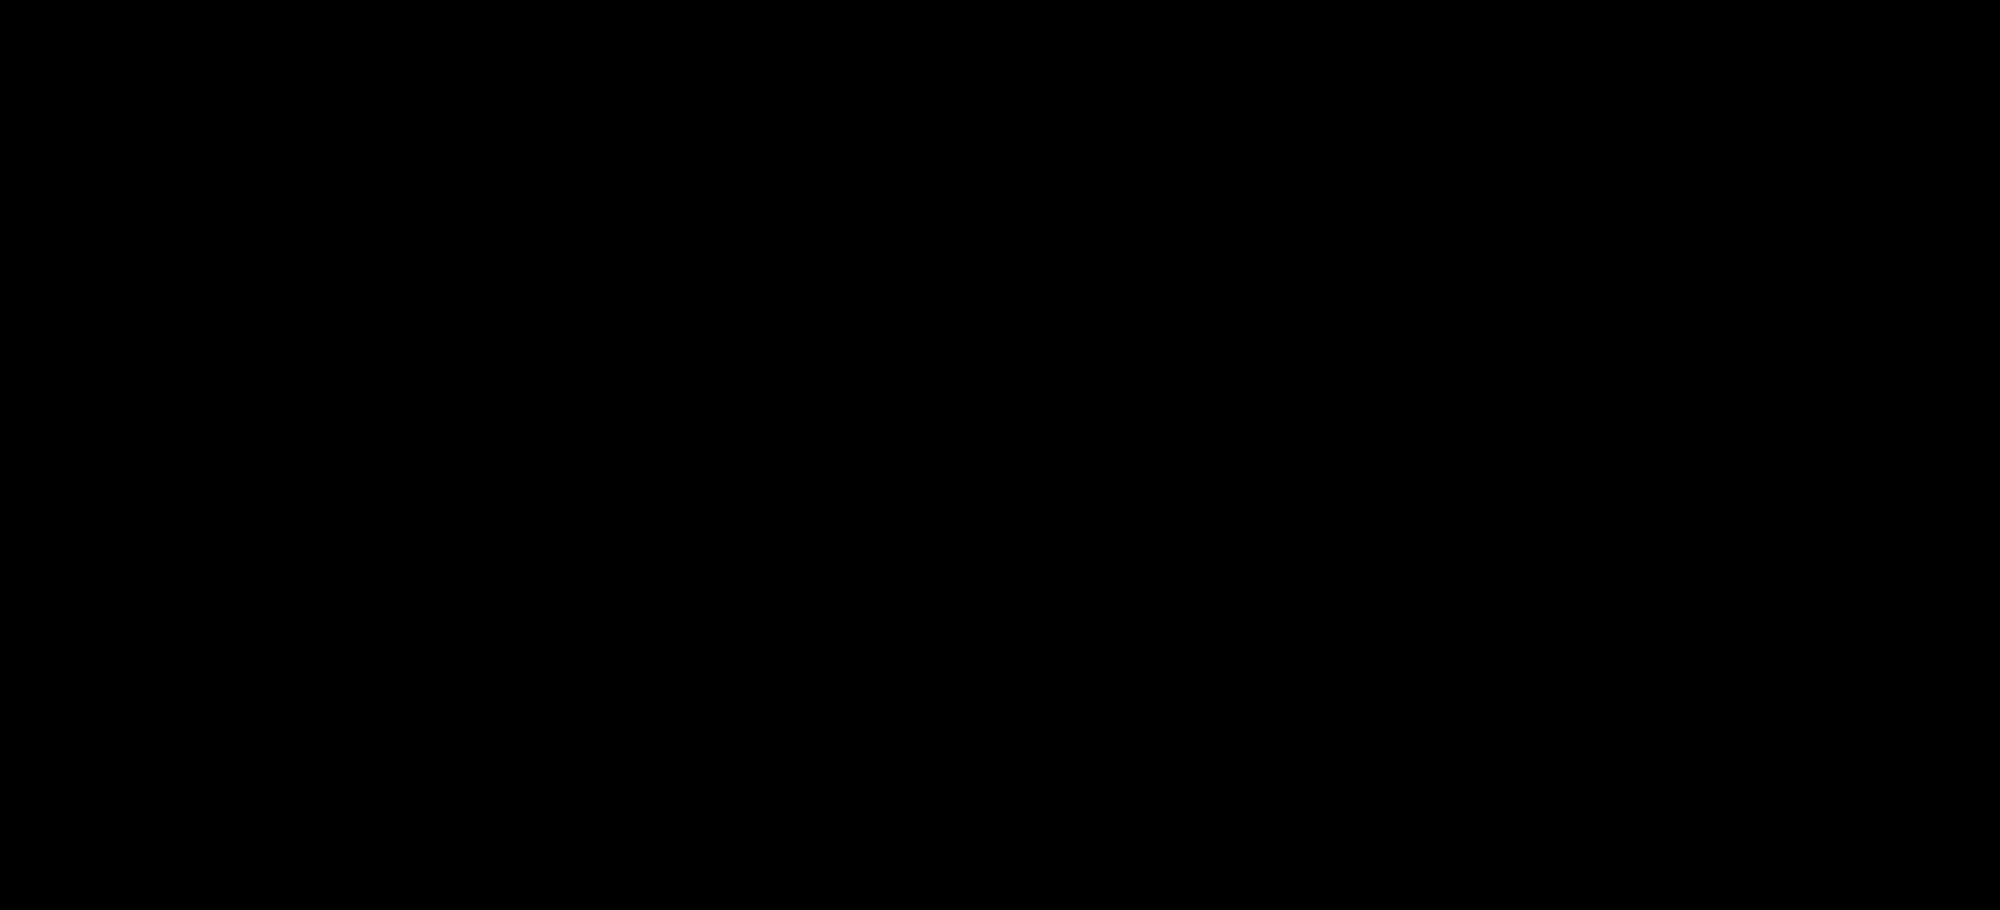 L - Methionine